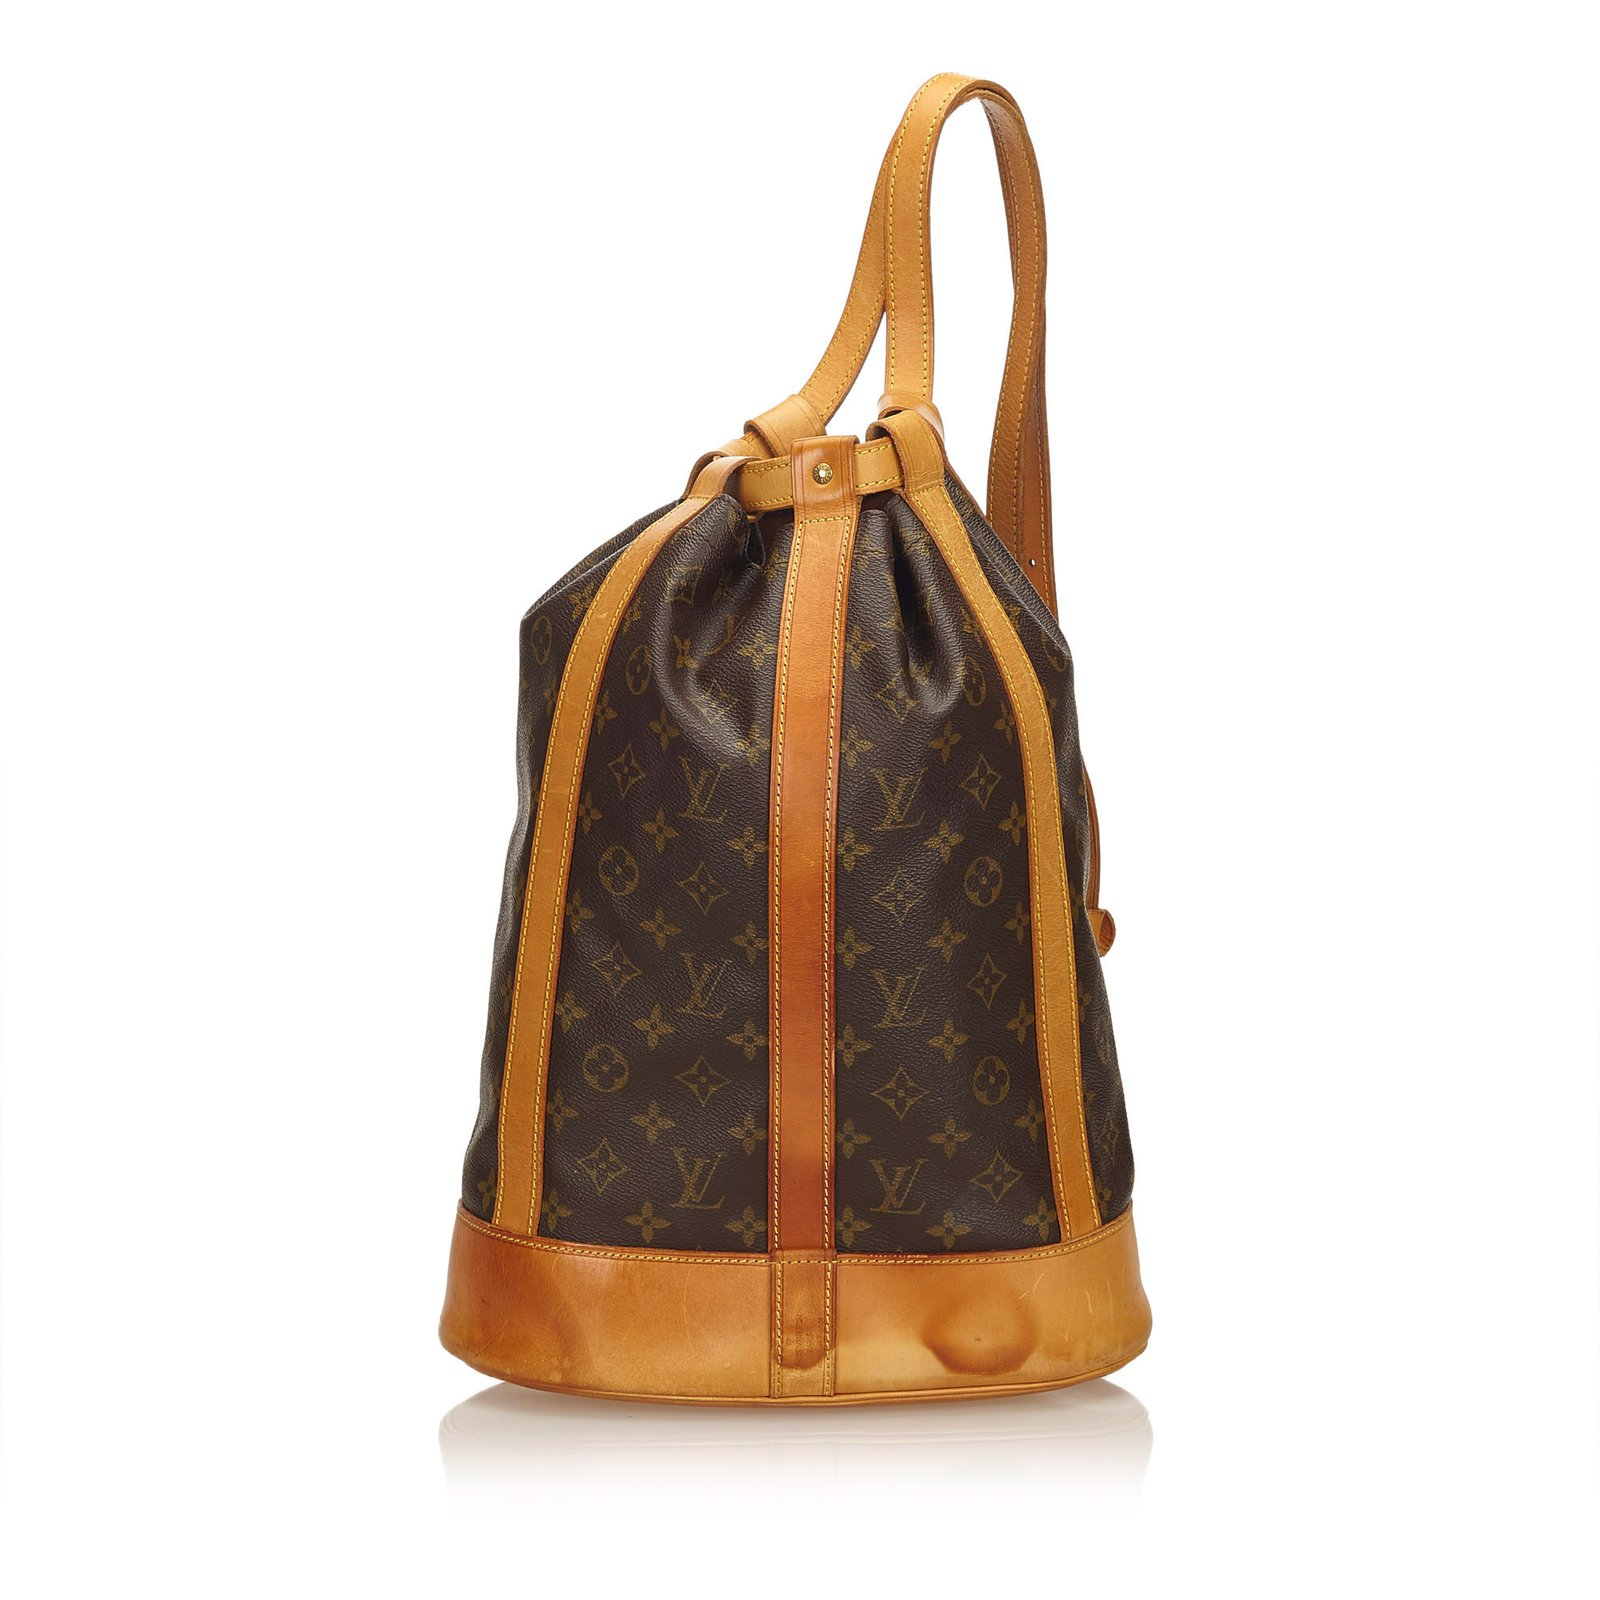 63b193993fea Louis Vuitton Monogram Randonnee GM Backpacks Leather